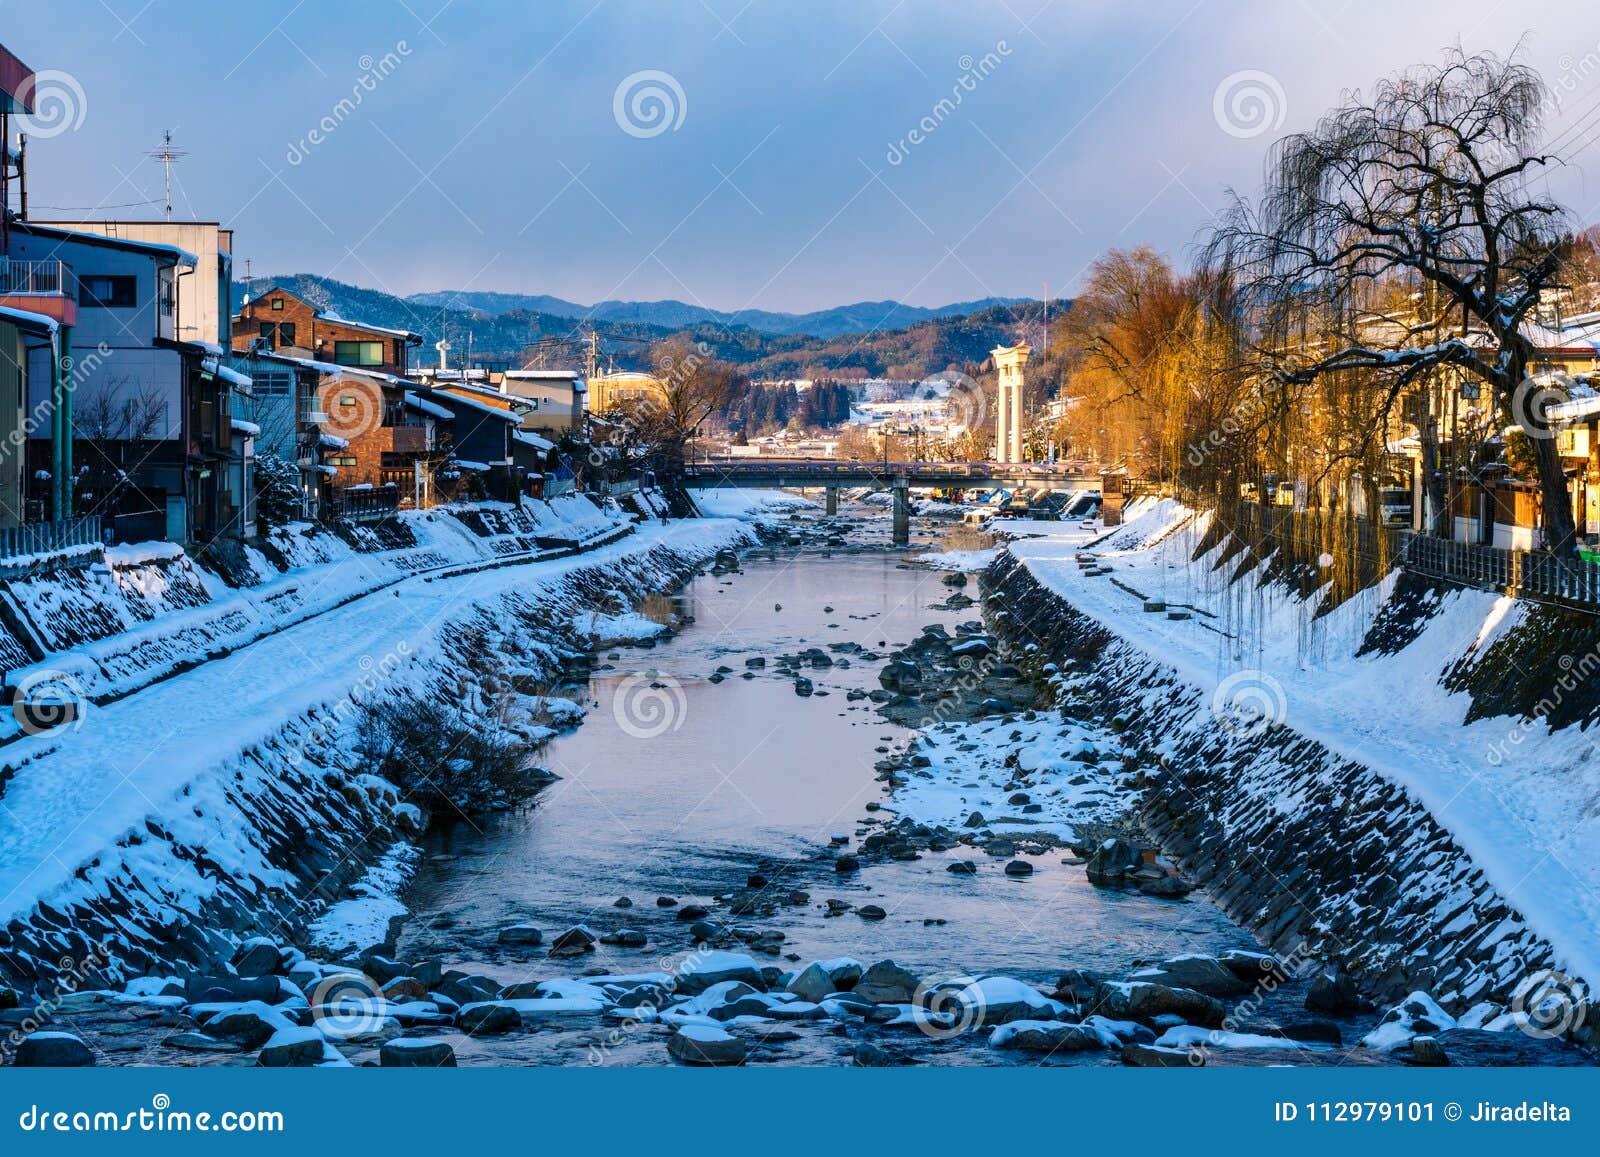 Miyagawanaka River of Takayama town in Winter